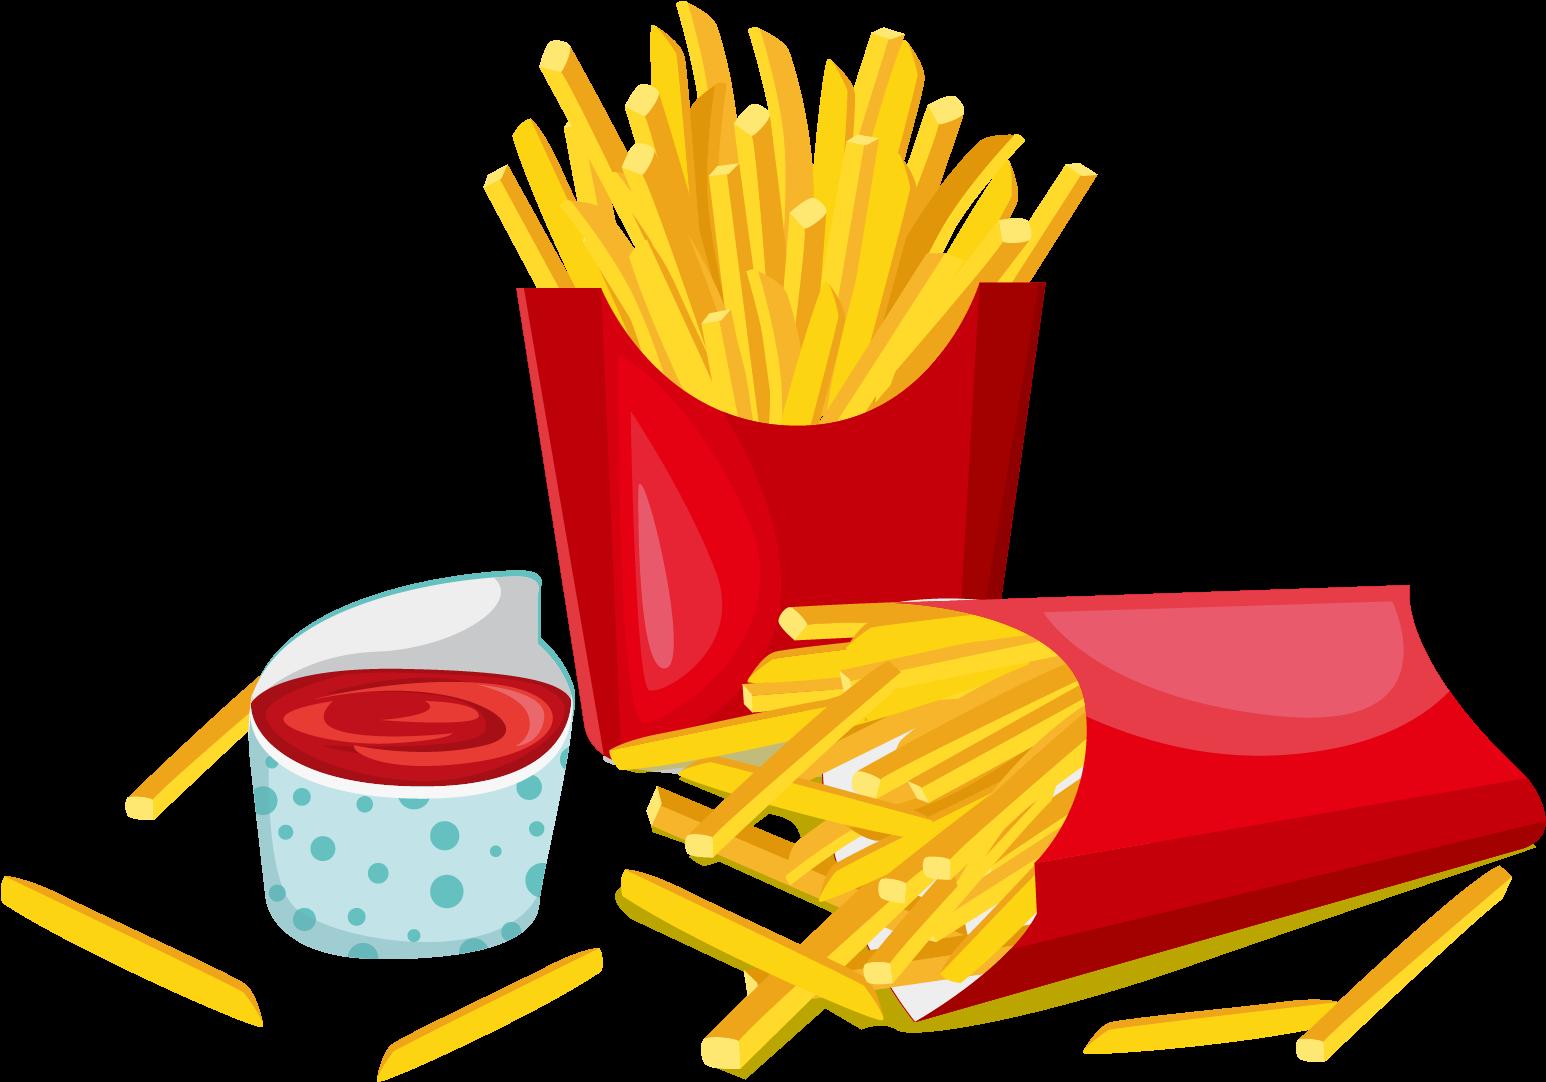 Hamburger hot dog french. Fries clipart hotdog fry